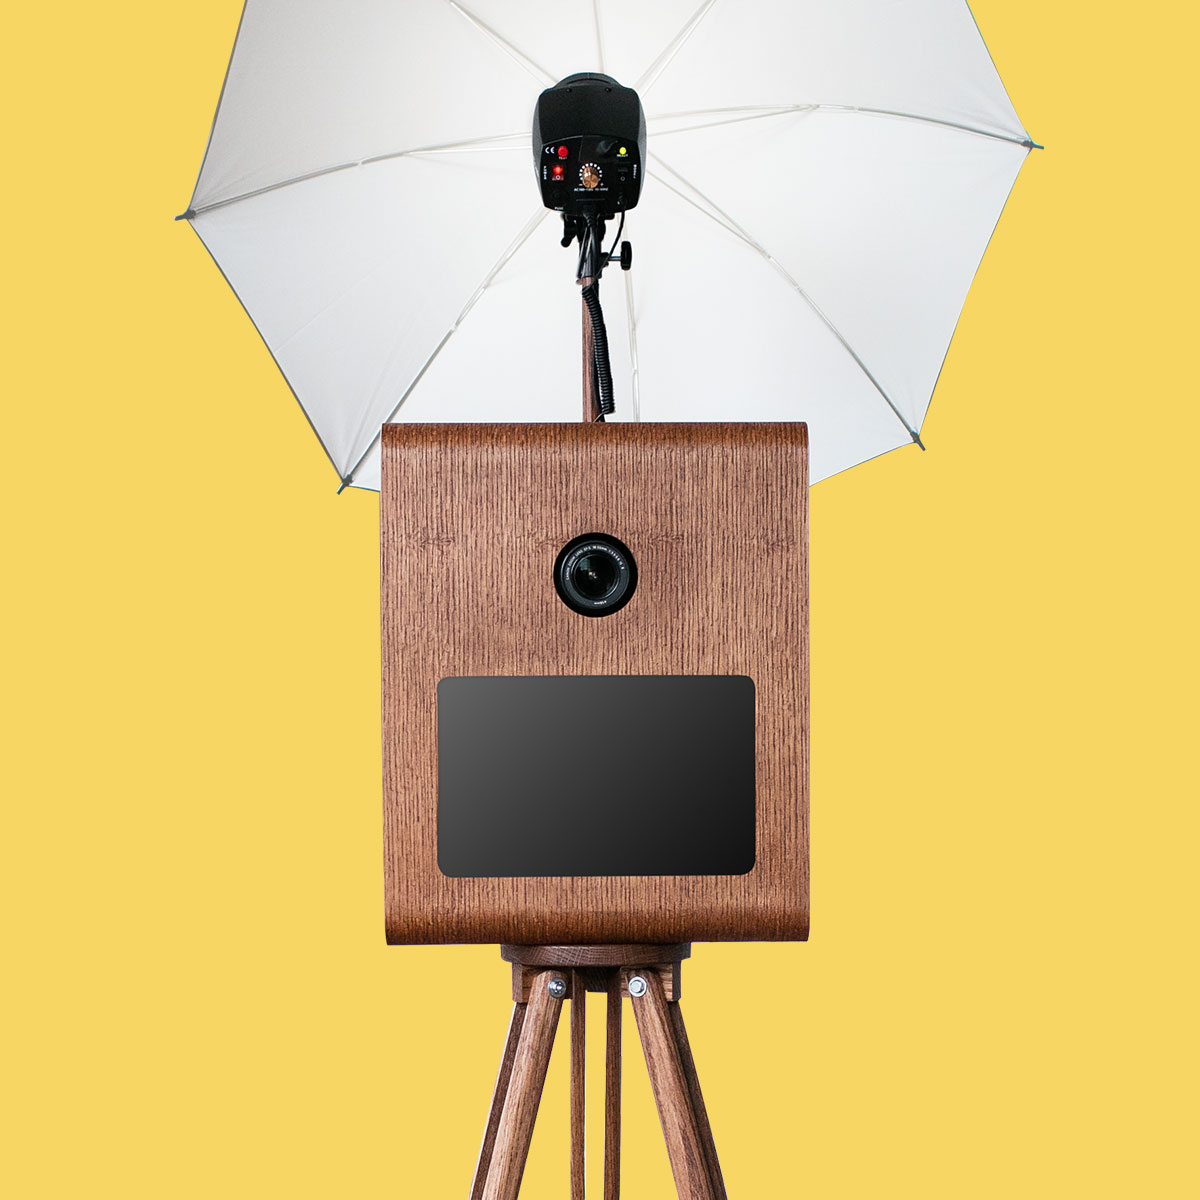 corporate-headshot-photo-booth